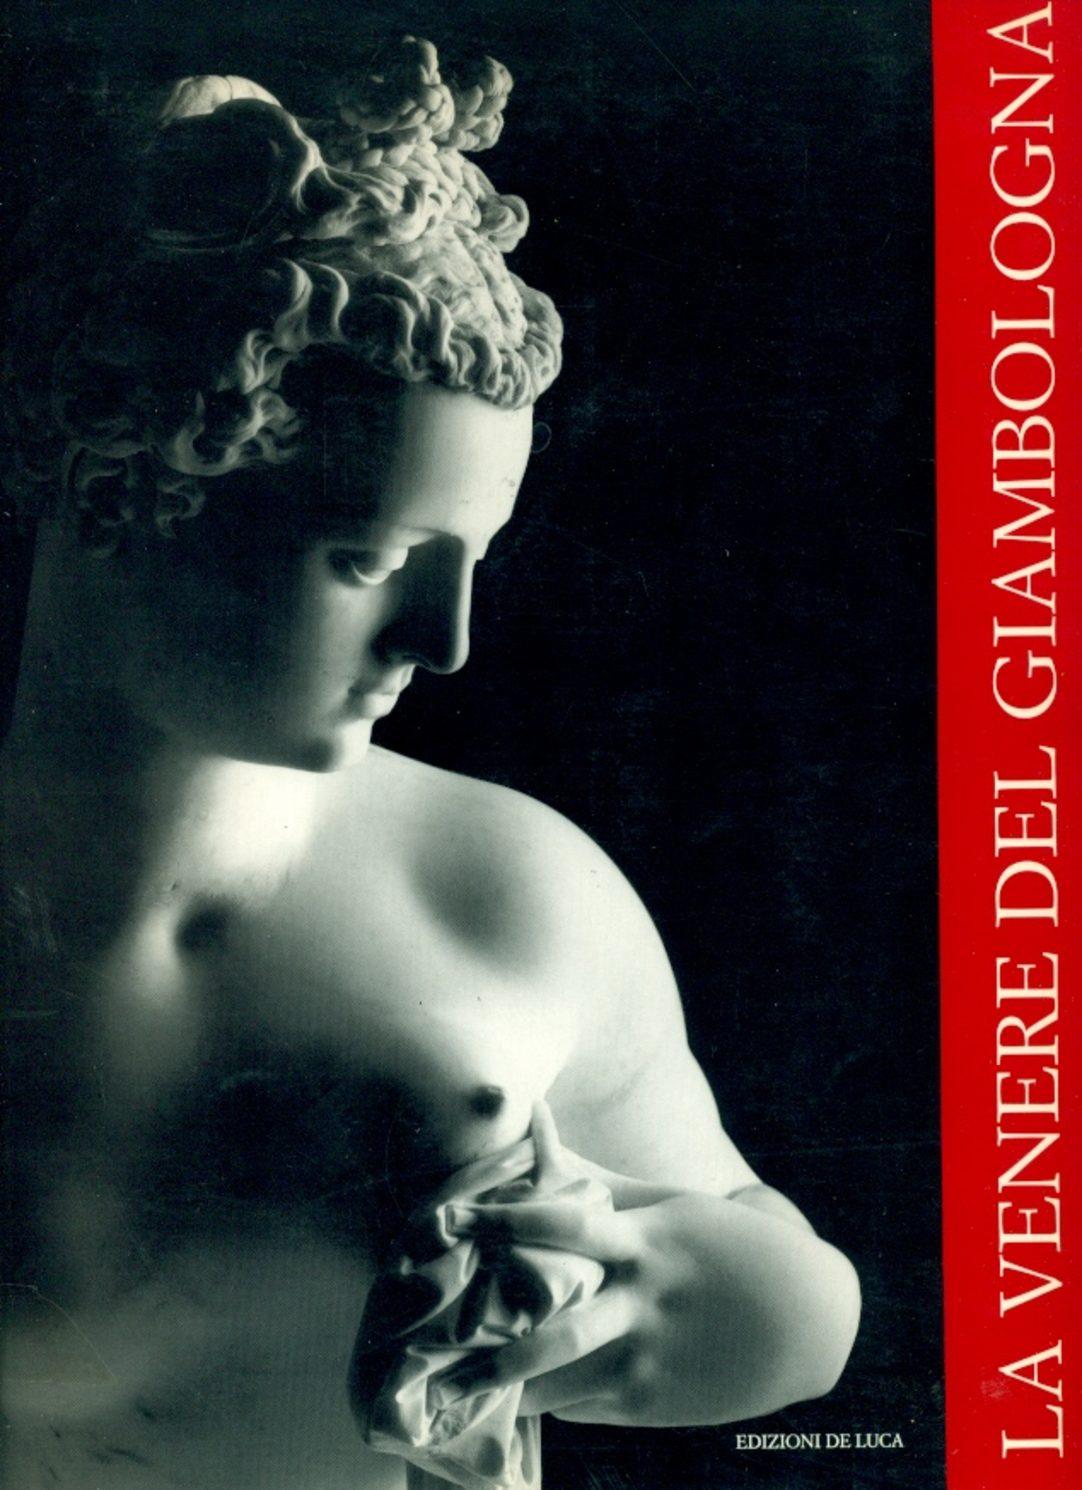 http://cbccoop.it/app/uploads/2017/06/COP-Venere-Giambologna-pdf.jpg